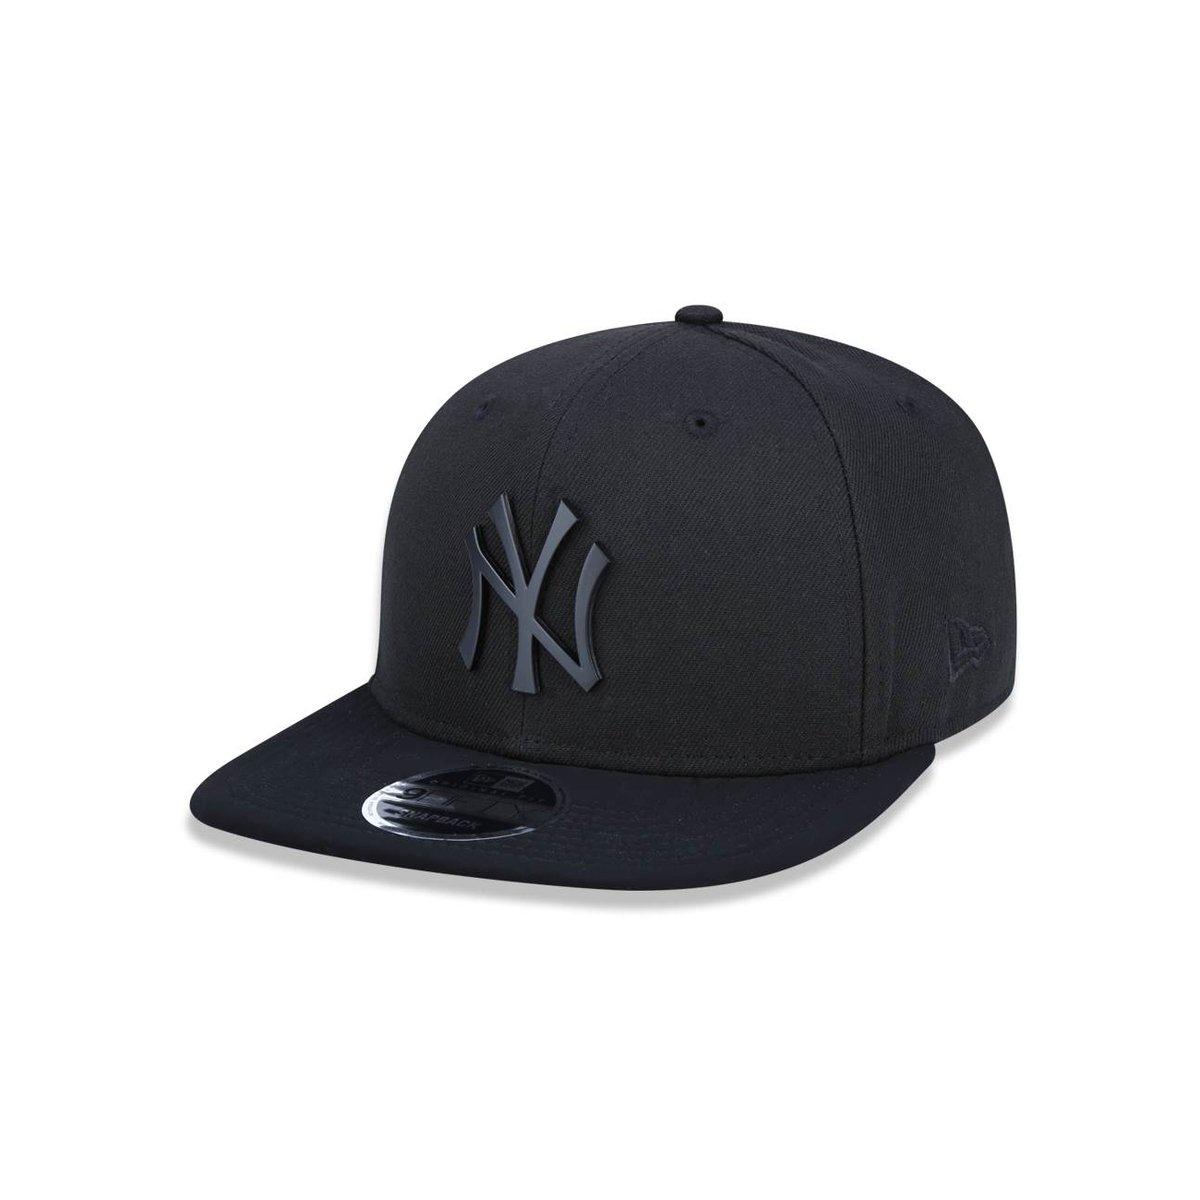 Boné 950 Original Fit New York Yankees MLB Aba Reta Snapback New Era ... 7951f1adb5c